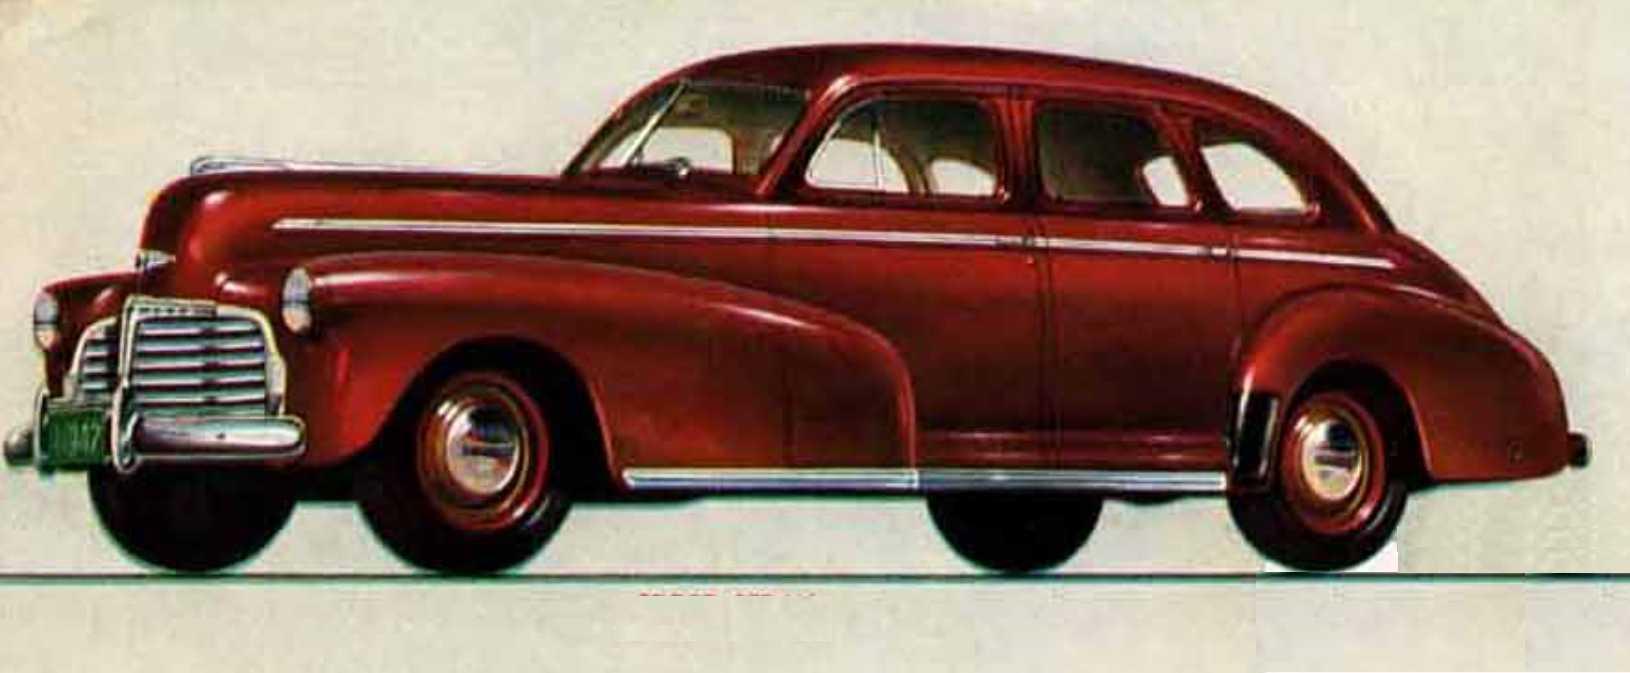 Chevrolet Master Deluxe Sport Sedan 3.5 Manual, 91hp, 1942